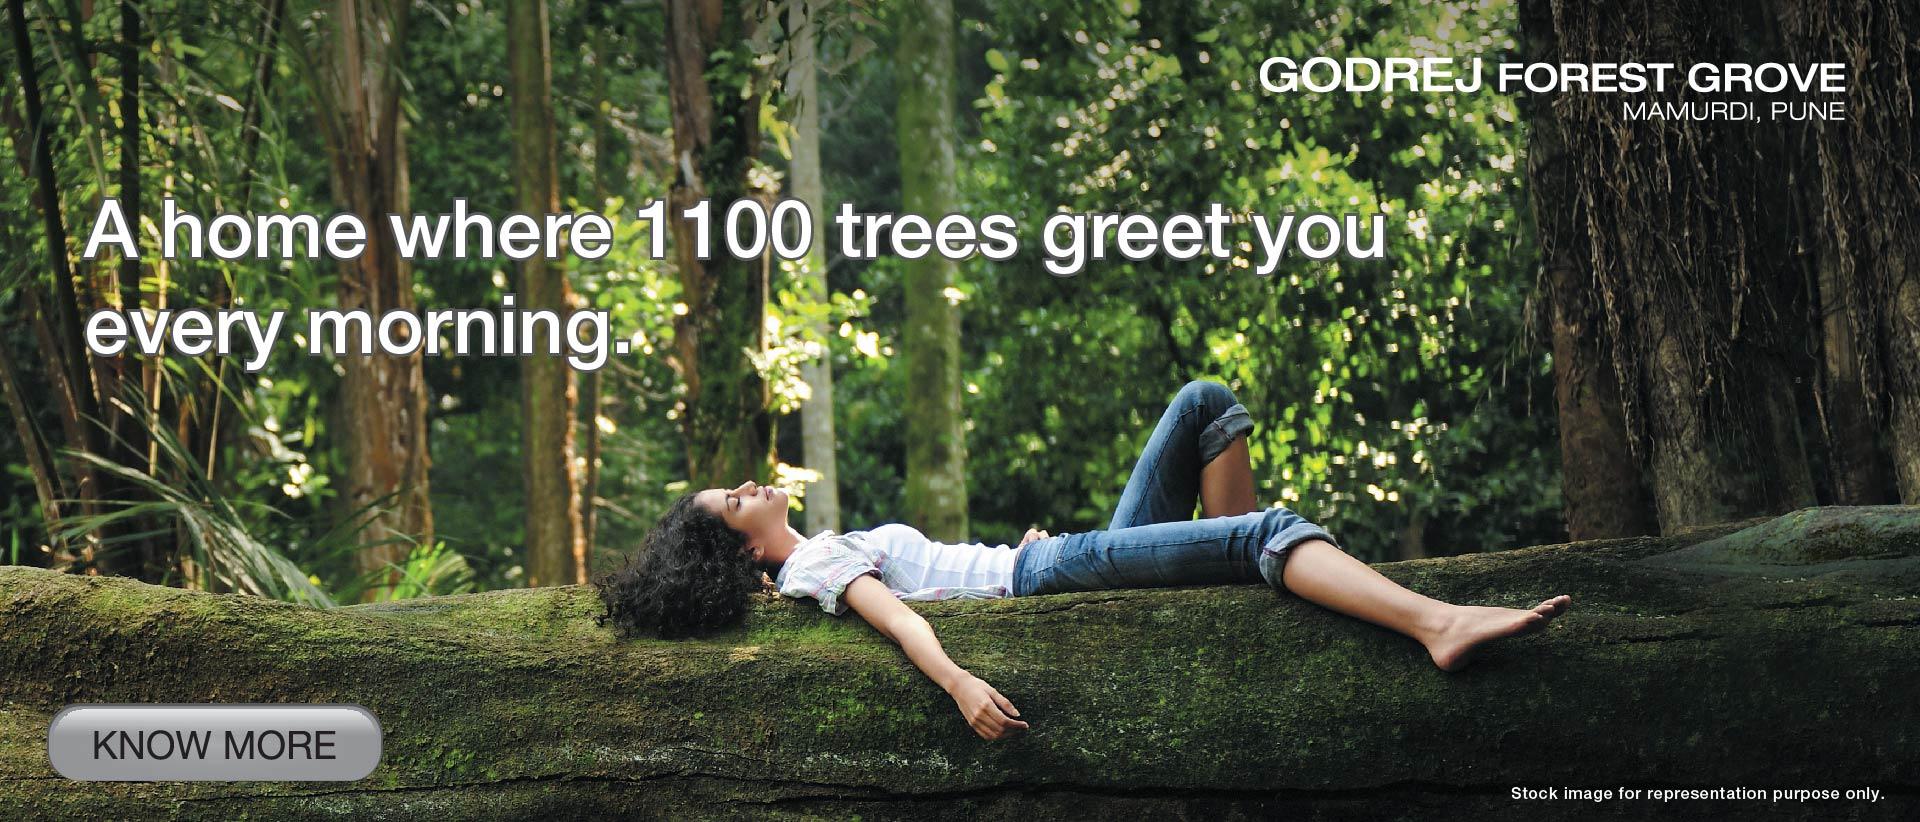 Godrej Forest Grove, Pune